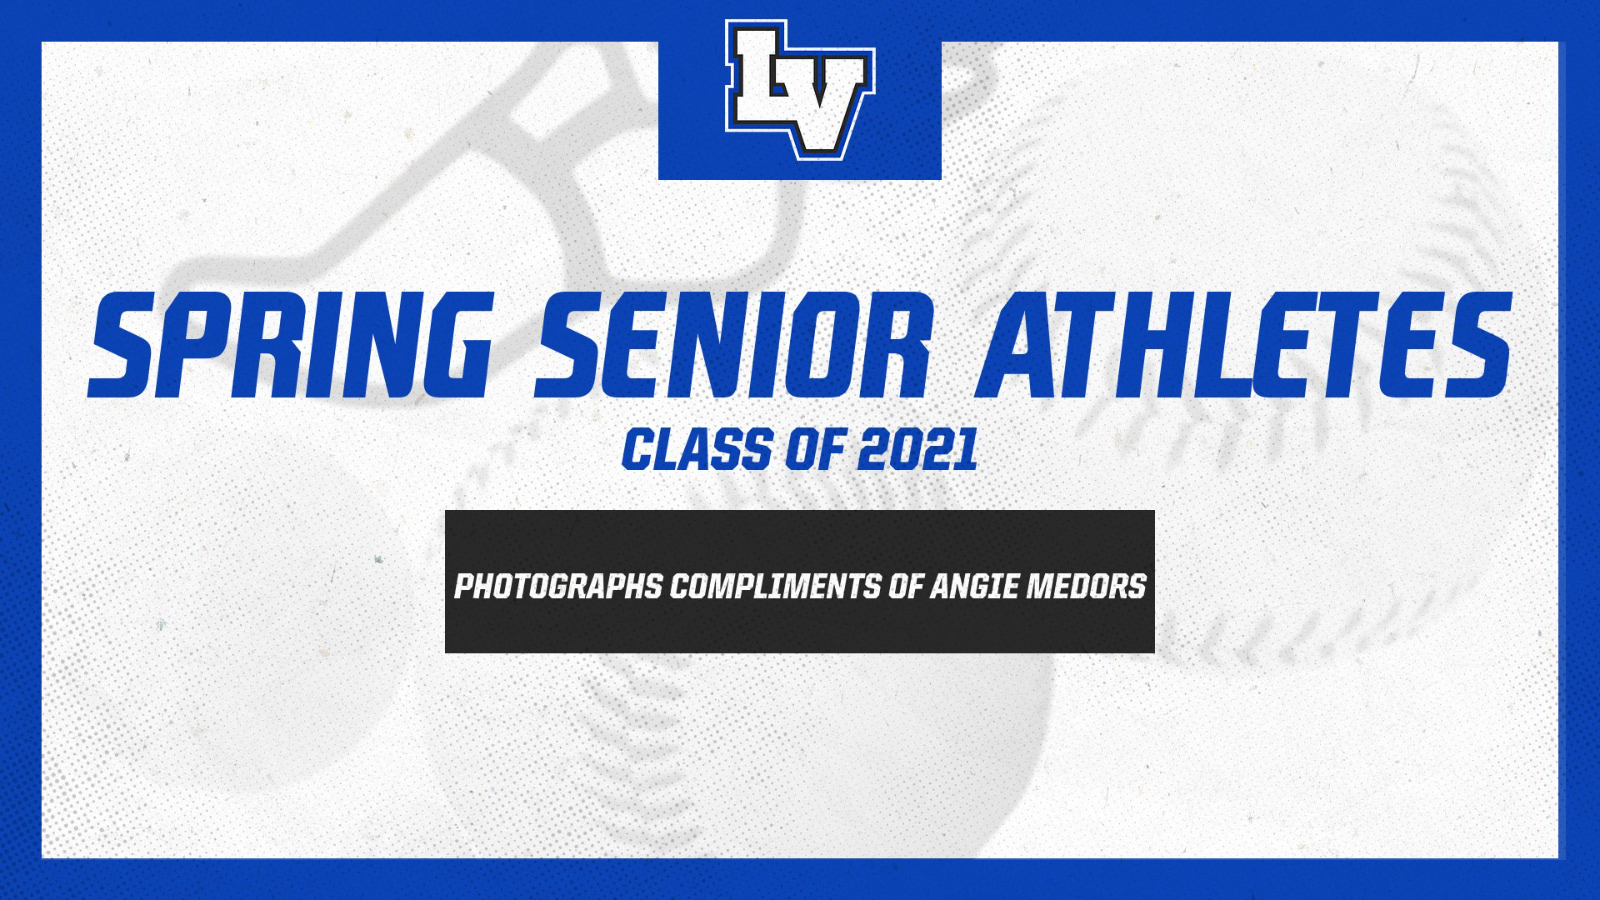 2021 LaVille Spring Senior Athletes